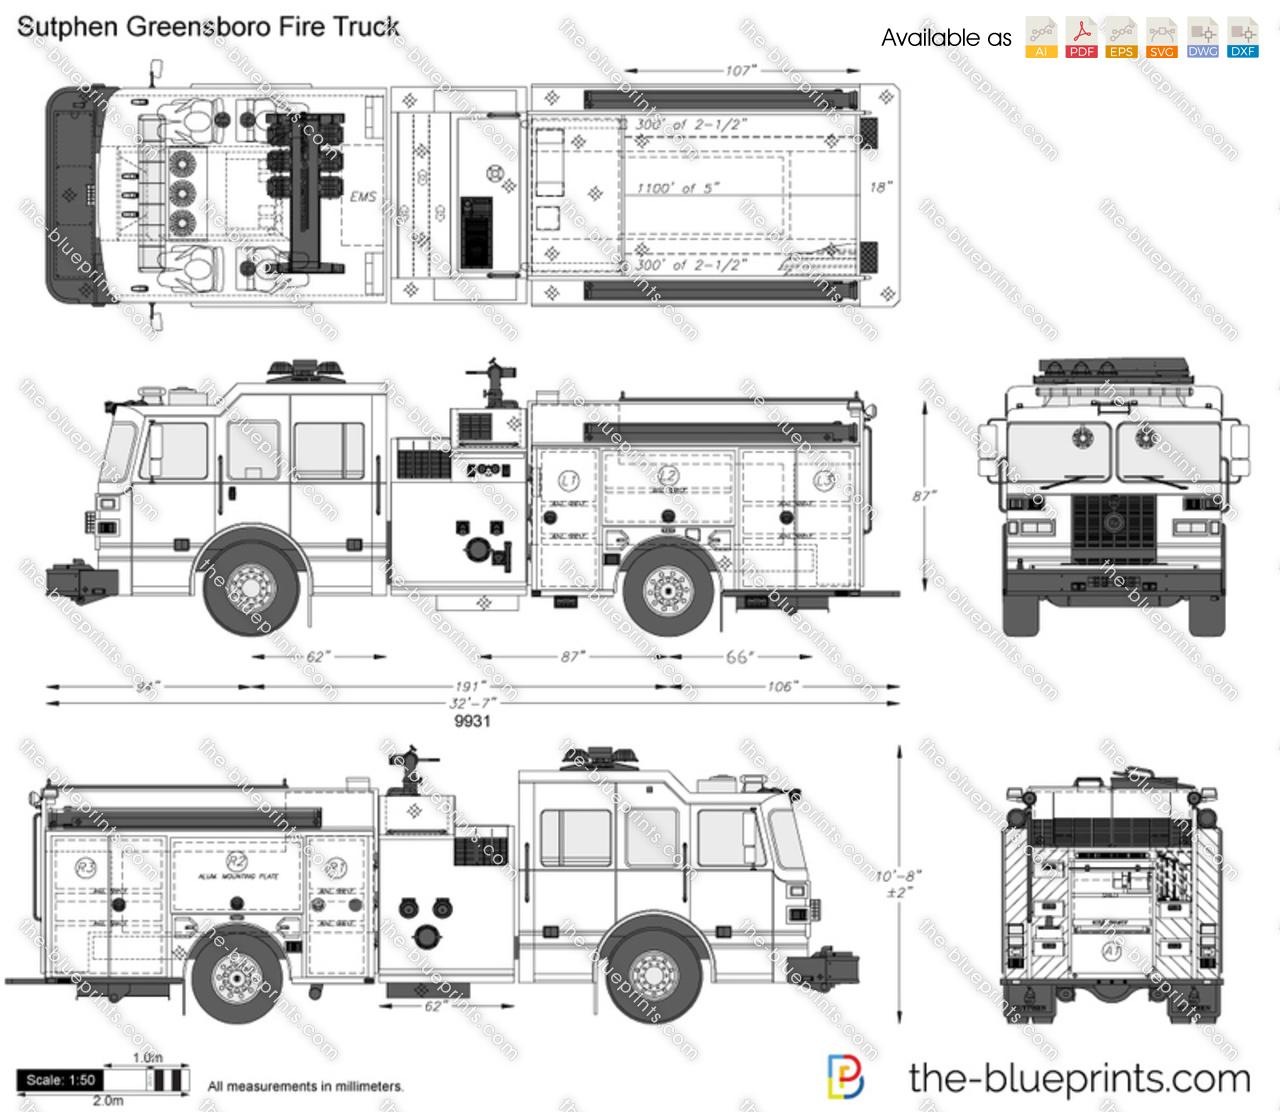 Sutphen Greensboro Fire Truck